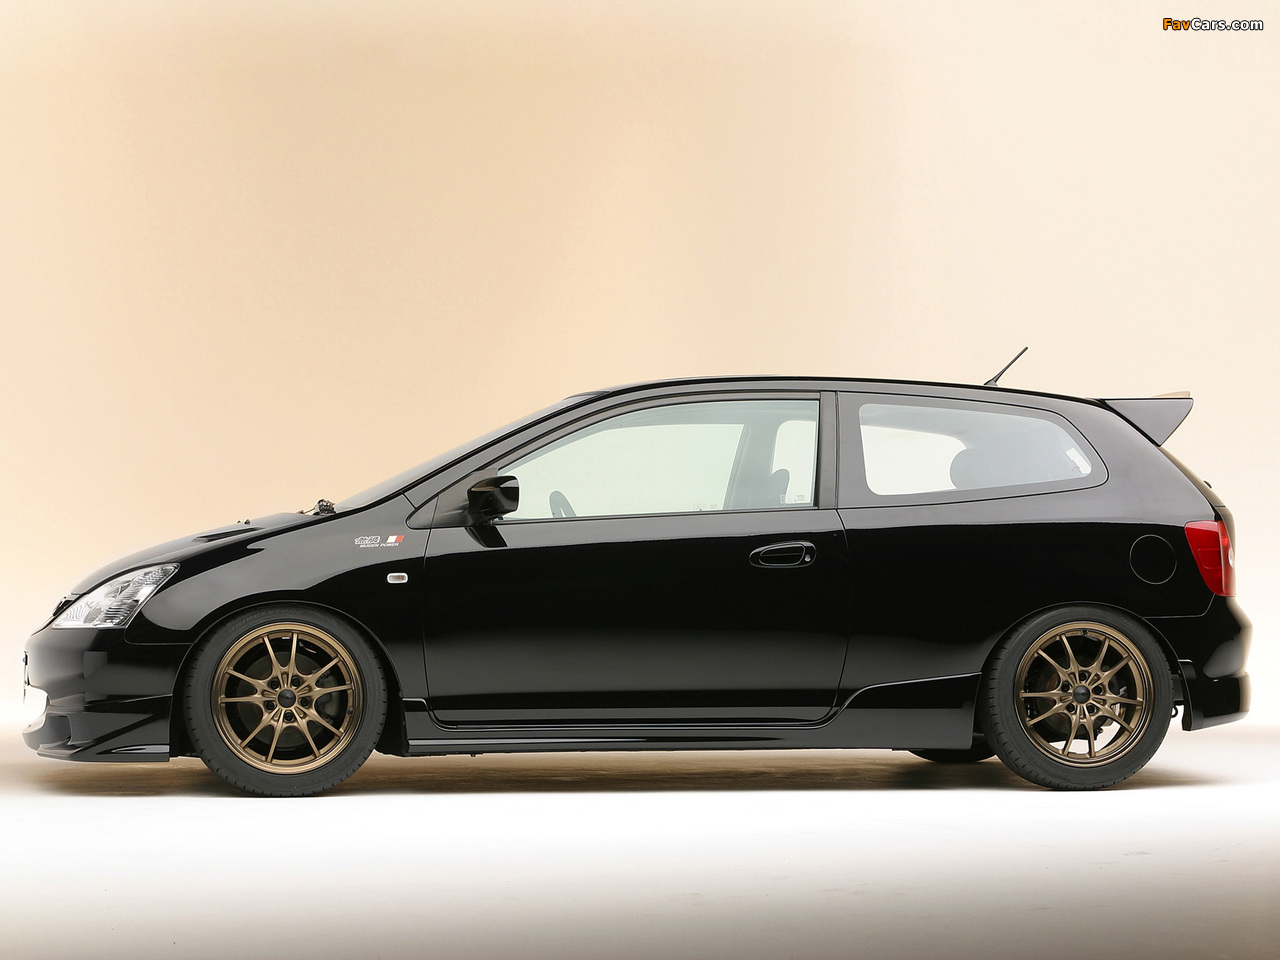 Image Result For Honda Civic Car Honda